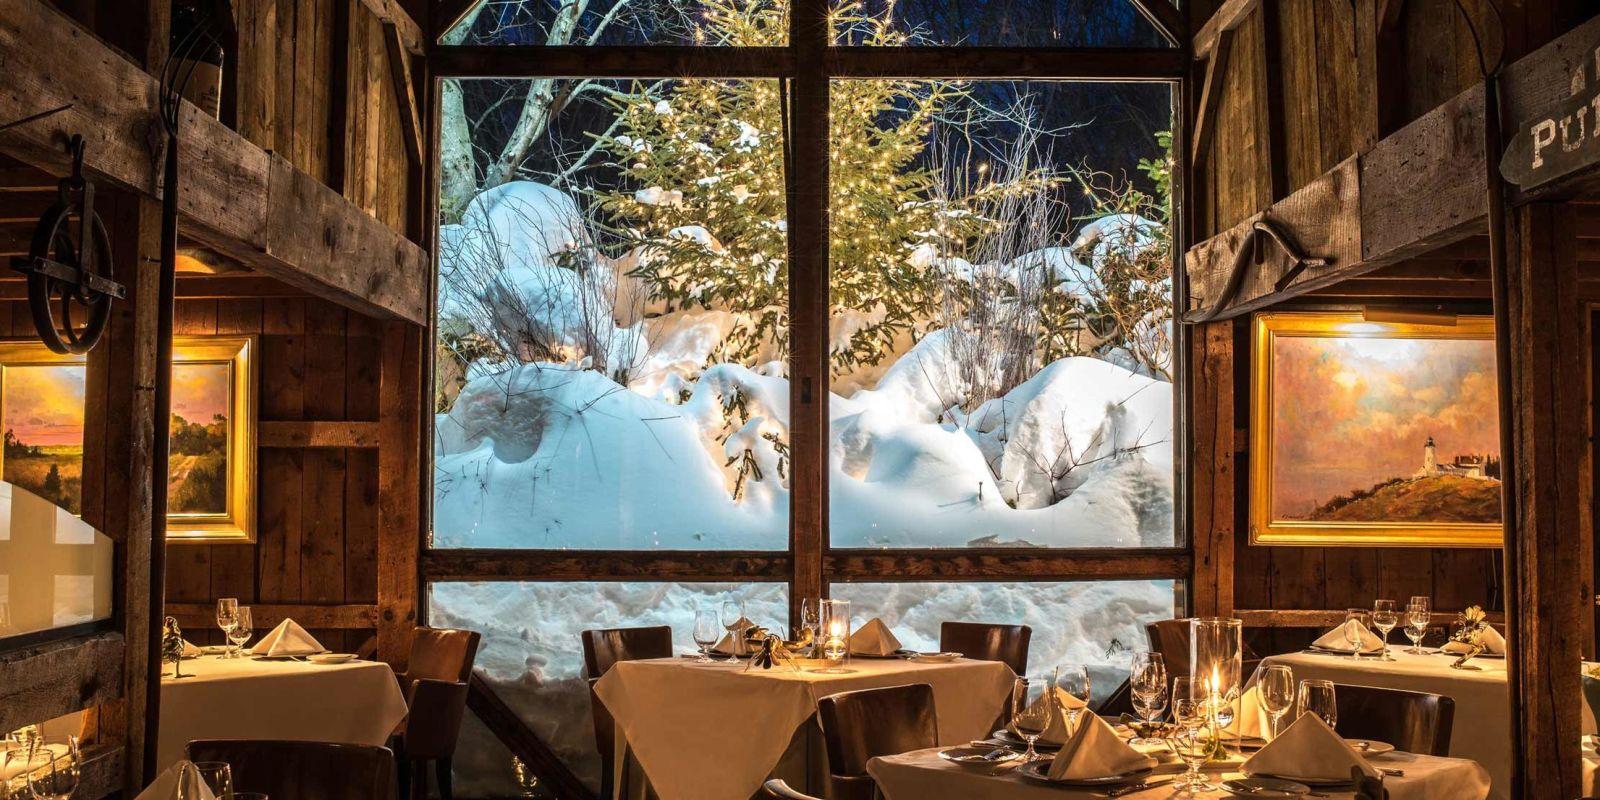 50 Most Romantic Restaurants   Best Restaurants For Valentineu0027s Day    Delish.com